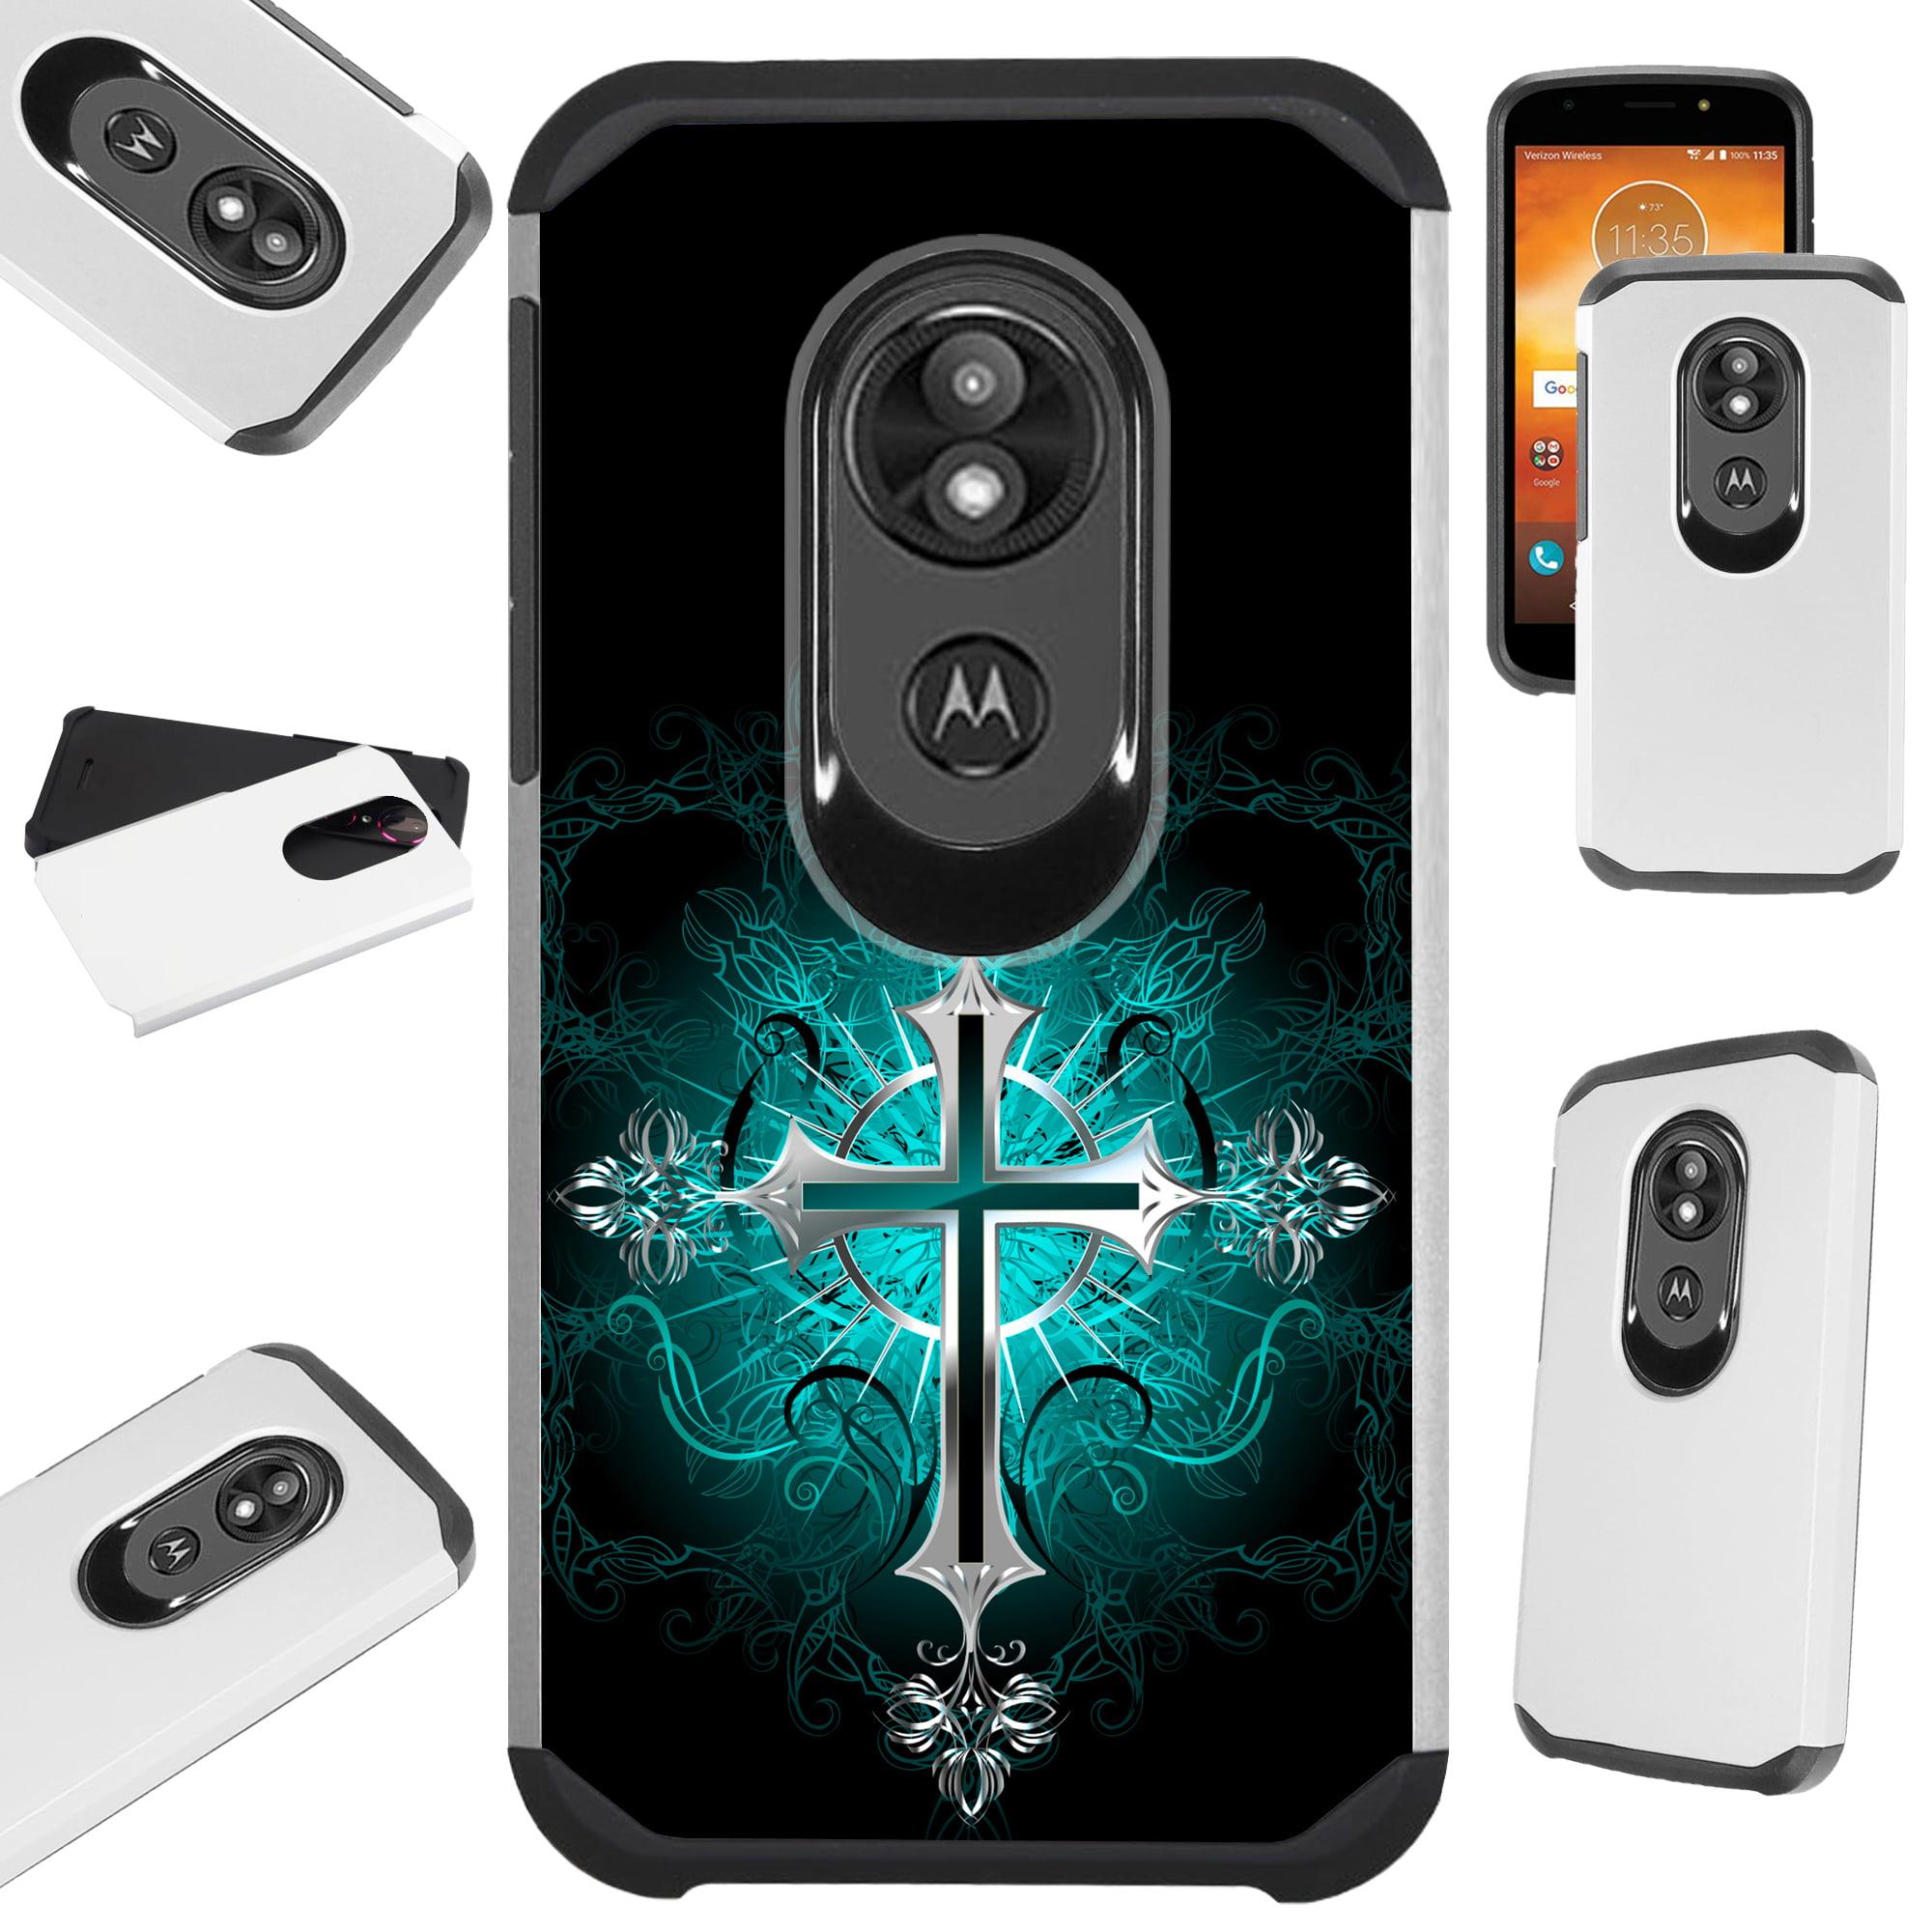 For Motorola Moto E5 Play | Moto E5 Cruise Case Hybrid TPU Fusion Phone Cover (Teal Gothic Cross)